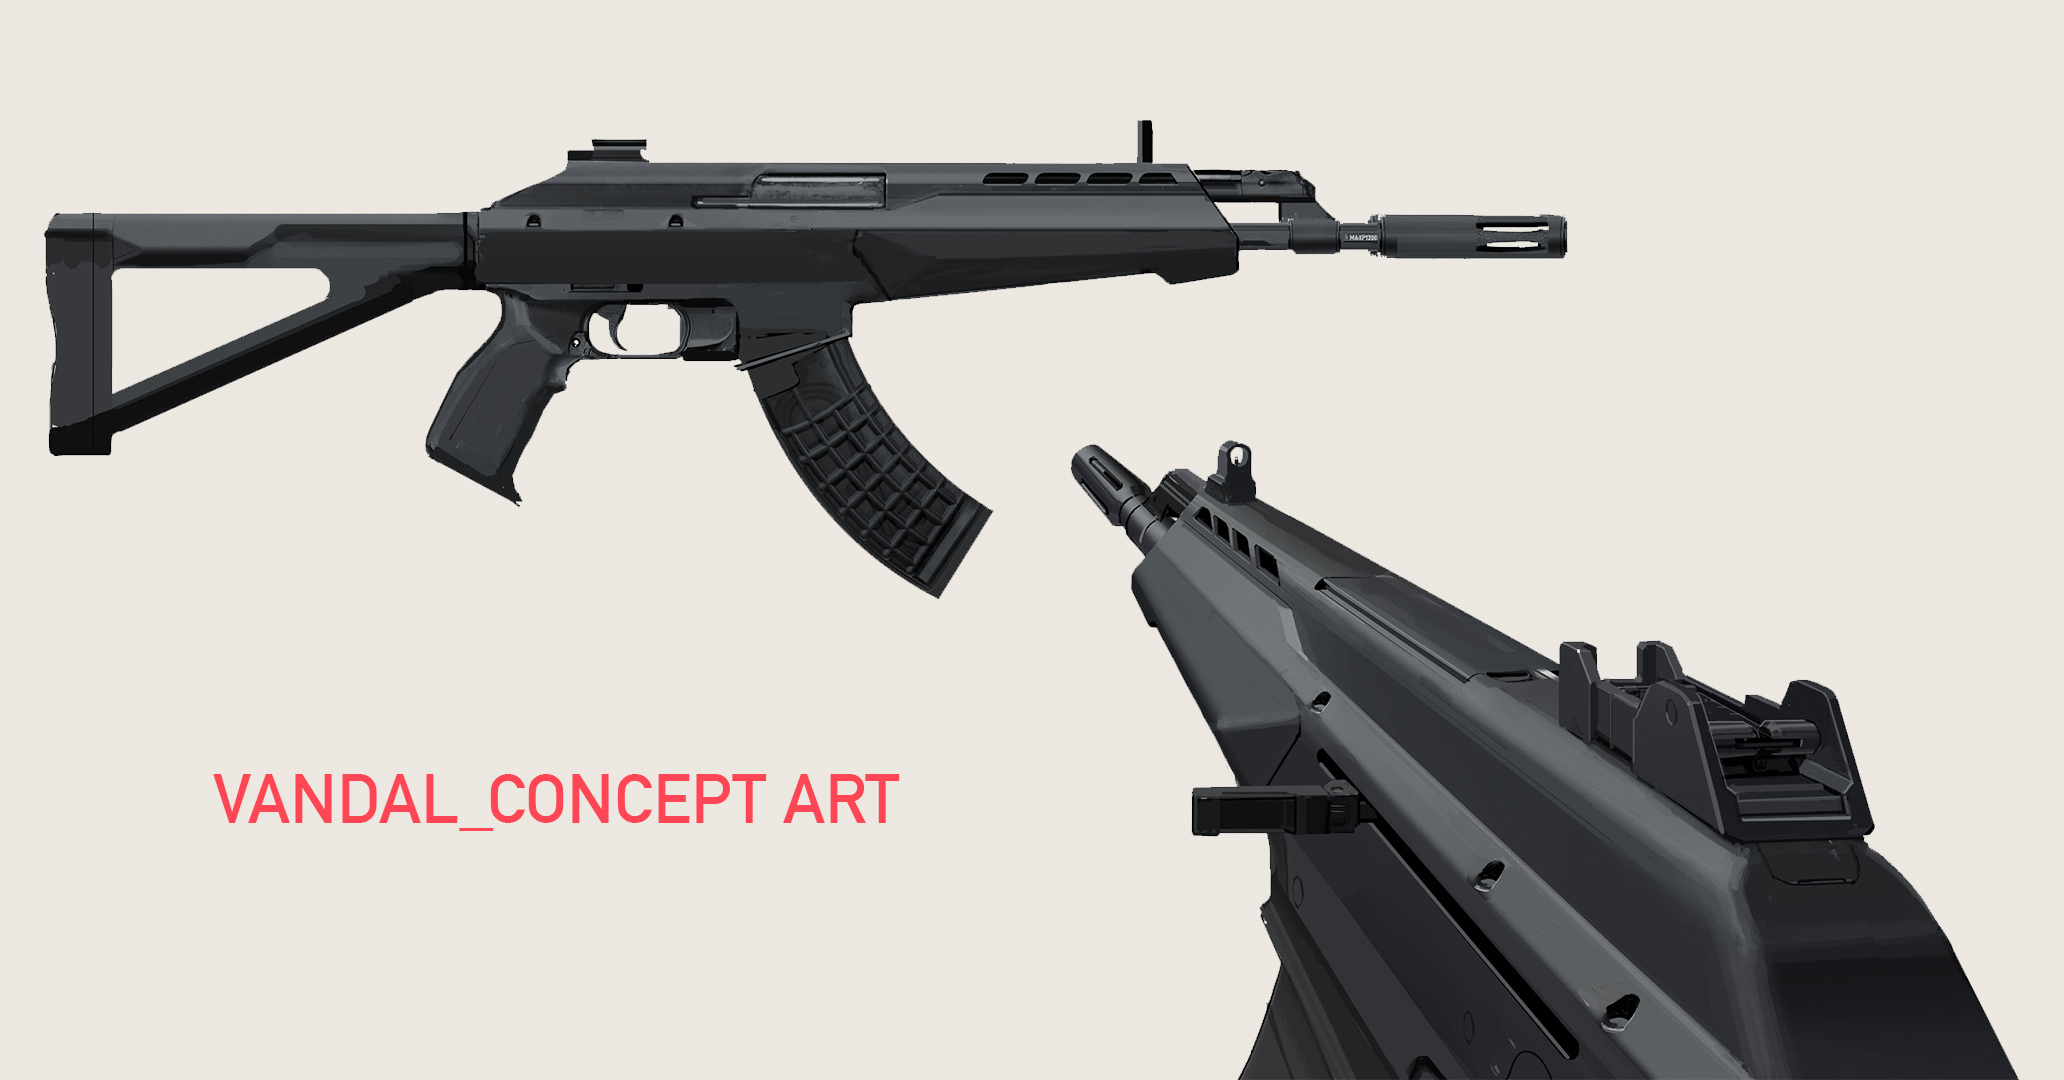 Vandal-Concept.jpg